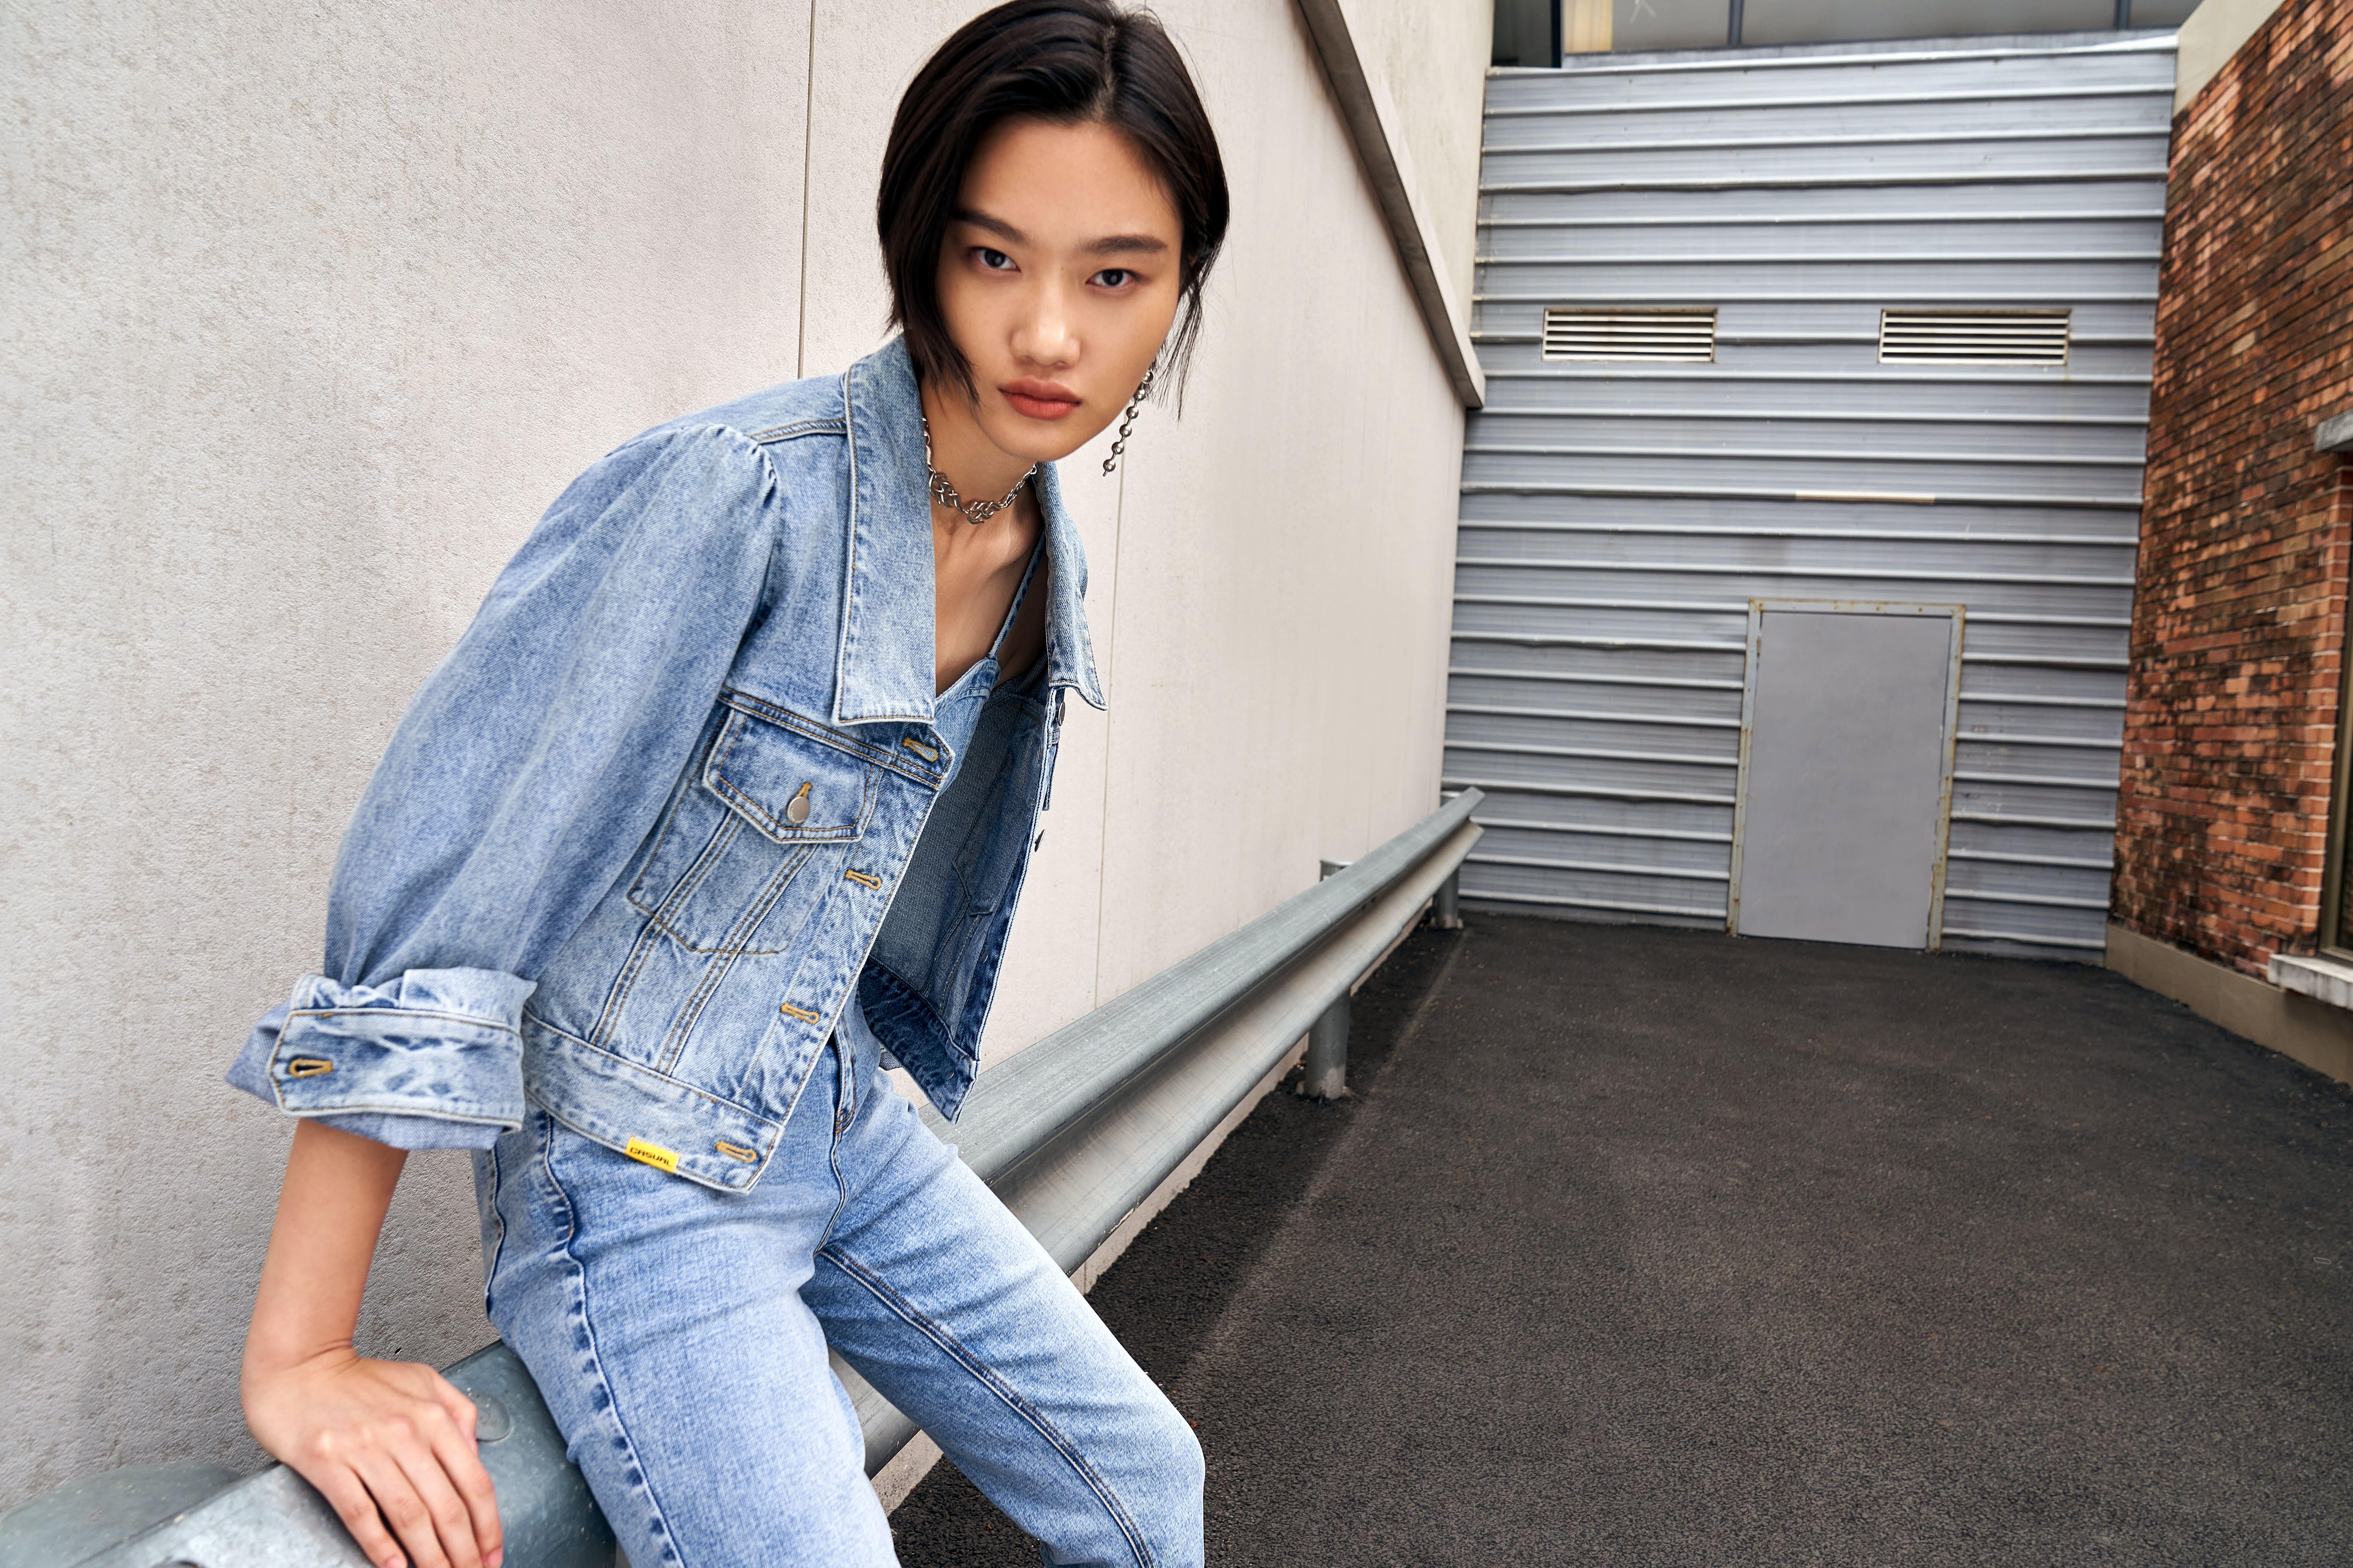 Women's Jeans Fit Guide